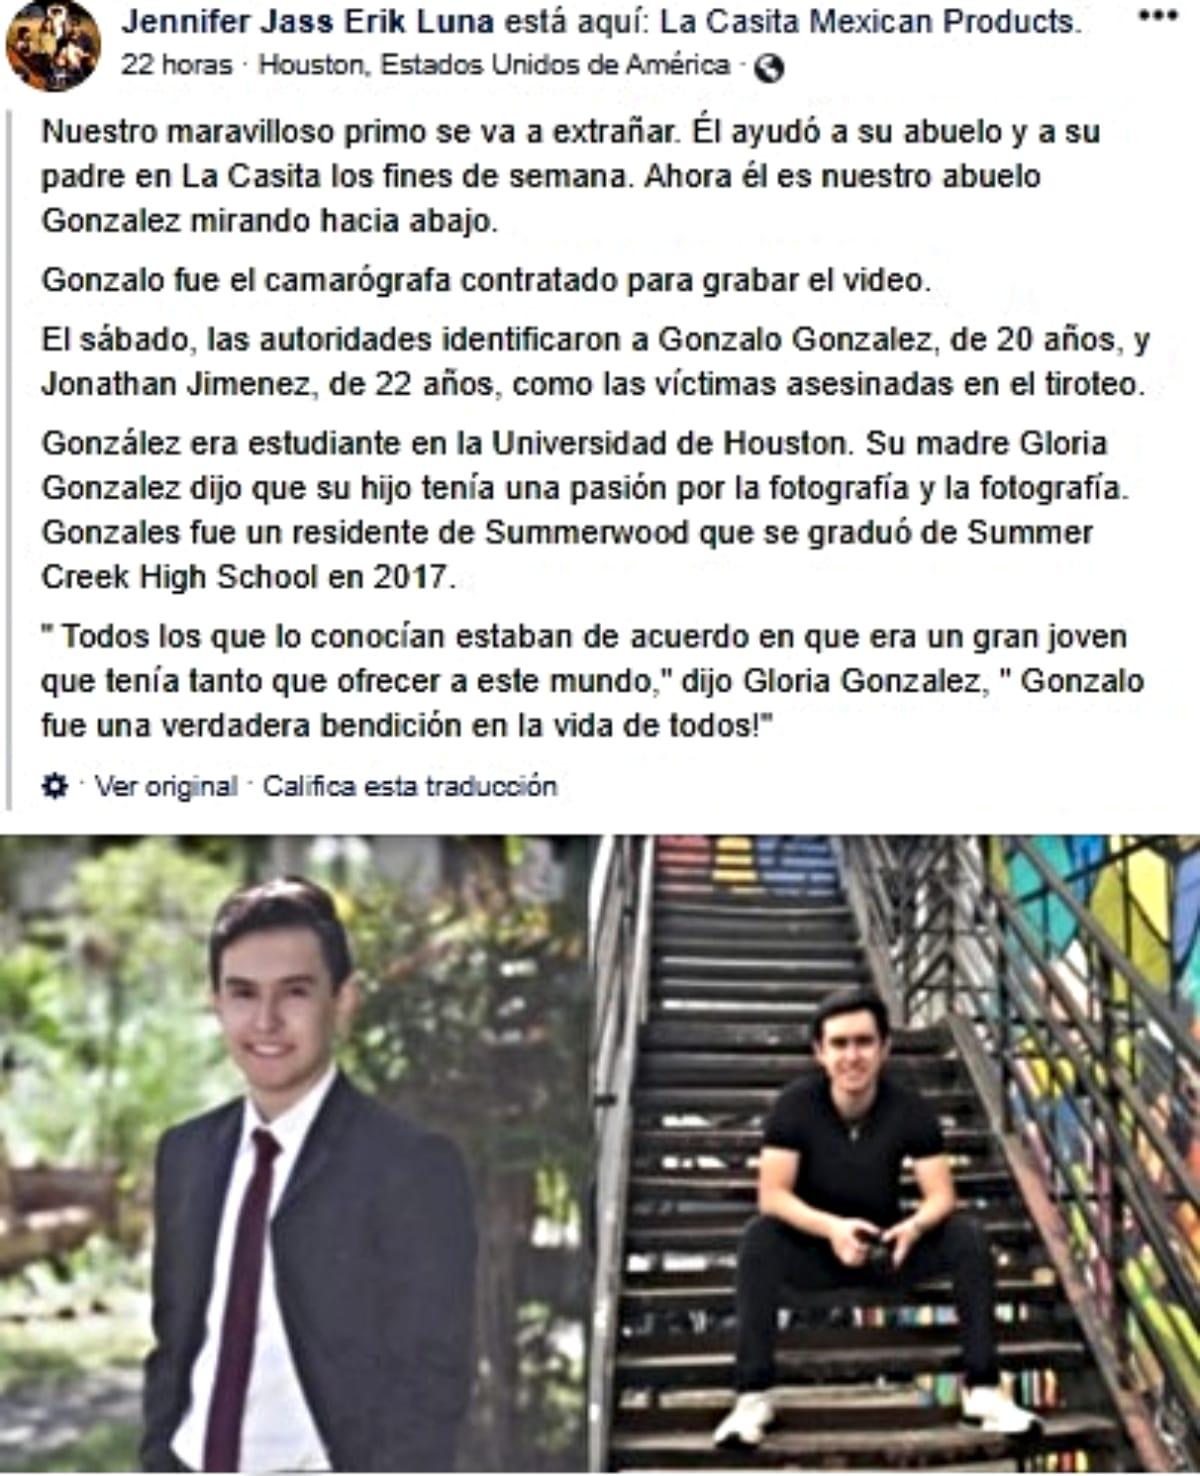 Gonzalo González